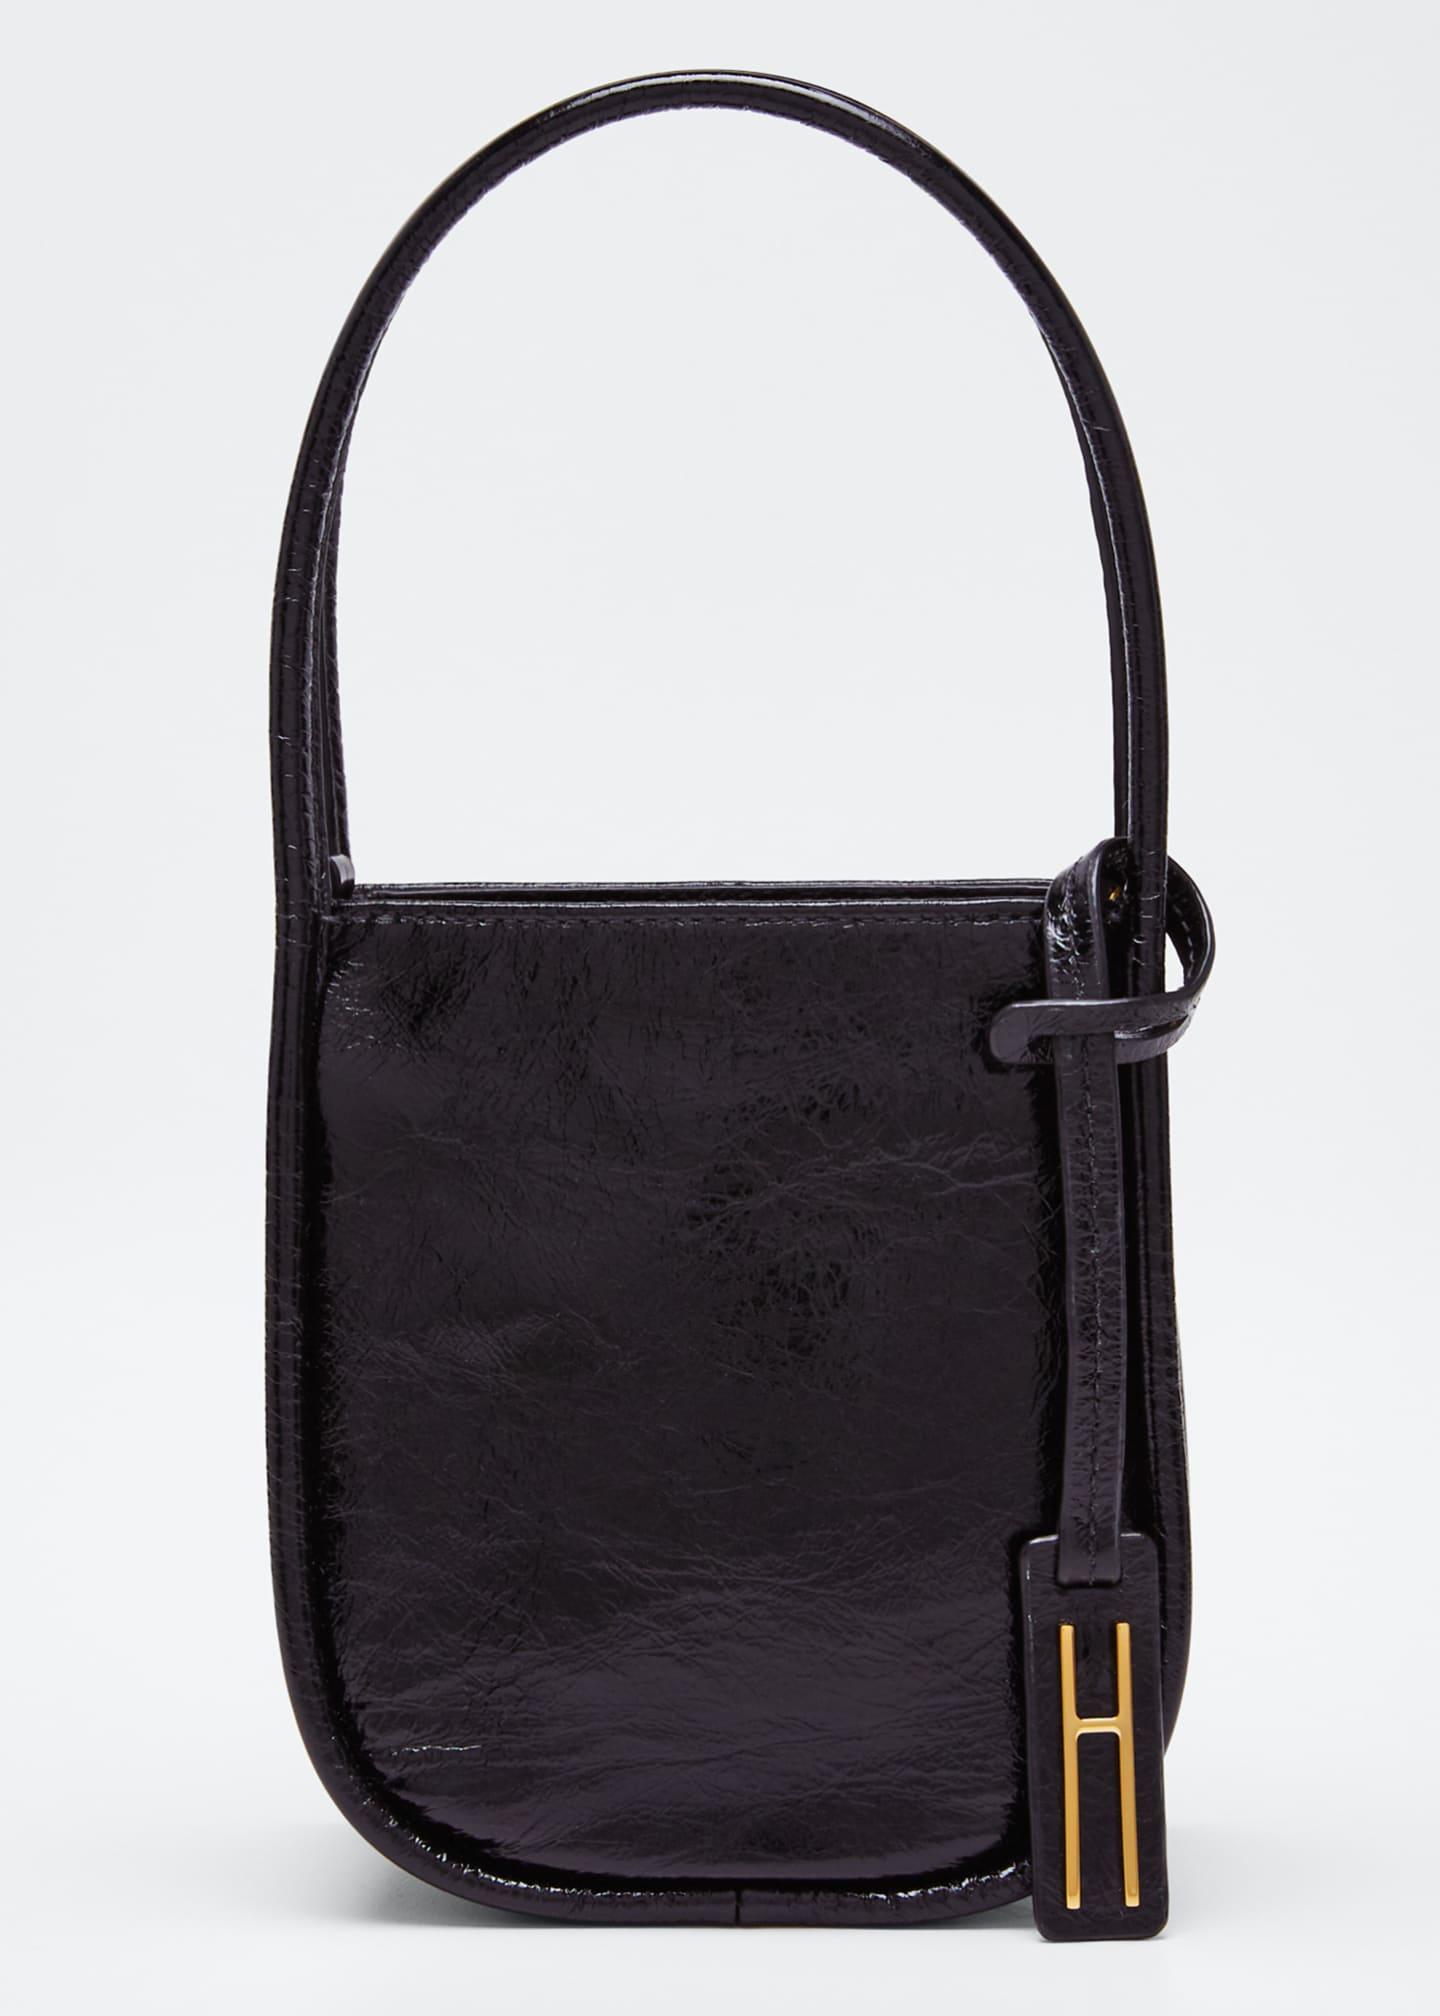 Hayward Guide Crinkled Leather Top-Handle Tote Bag